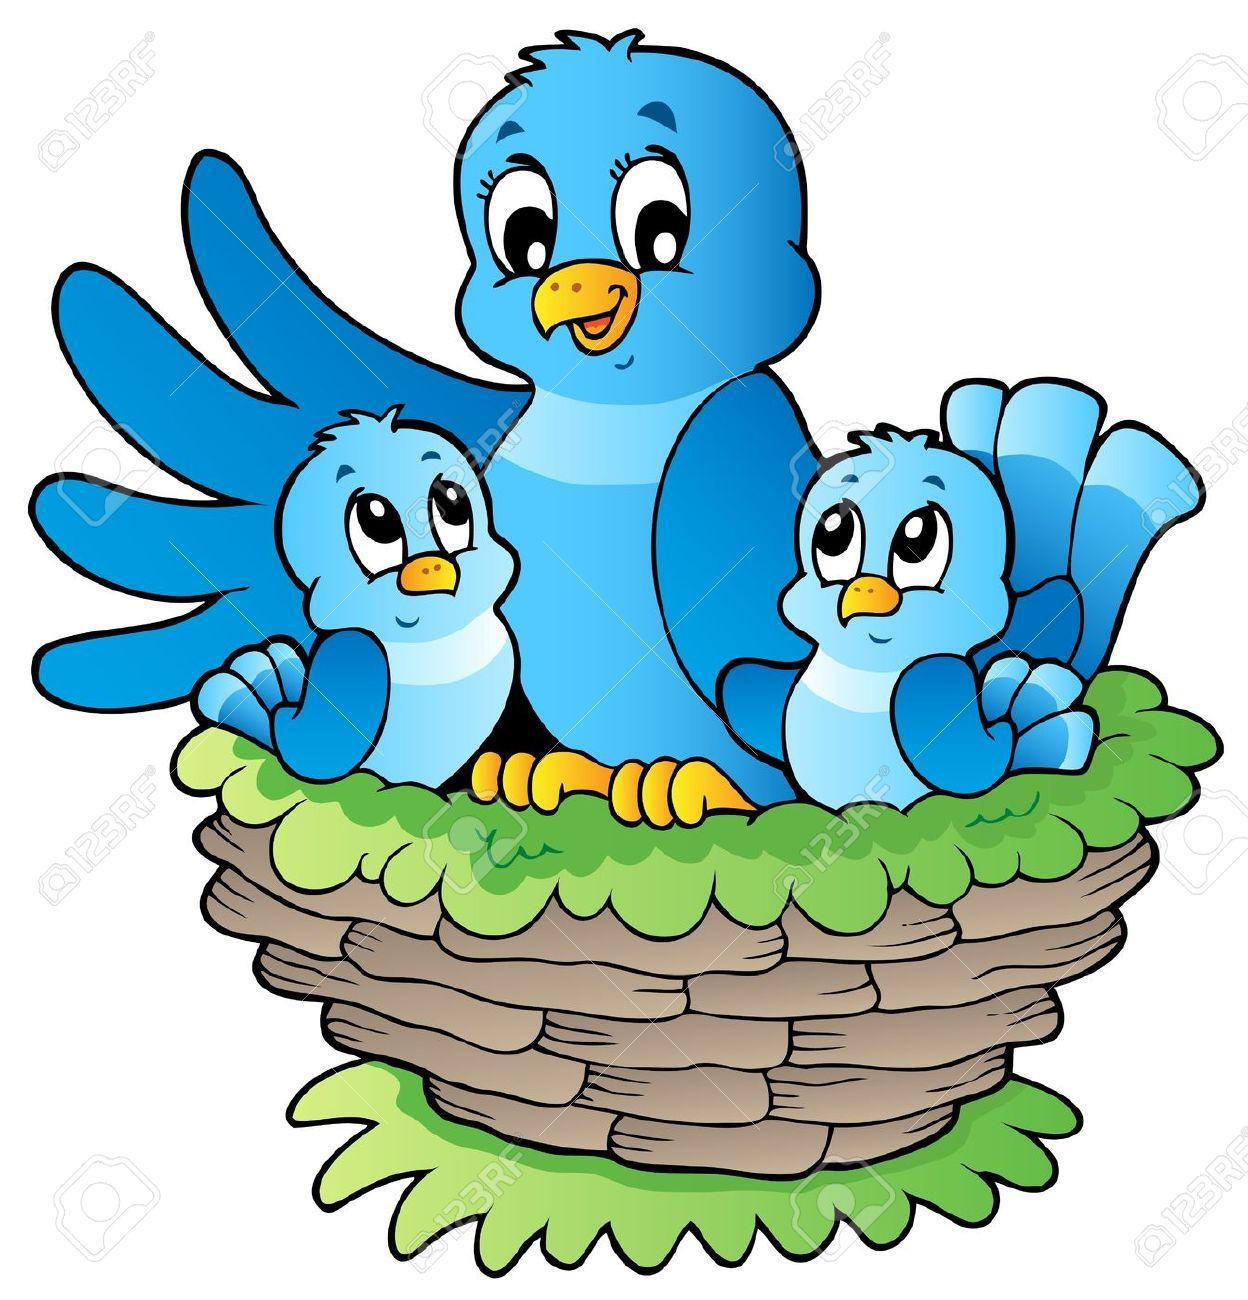 Bird Theme Image 3.